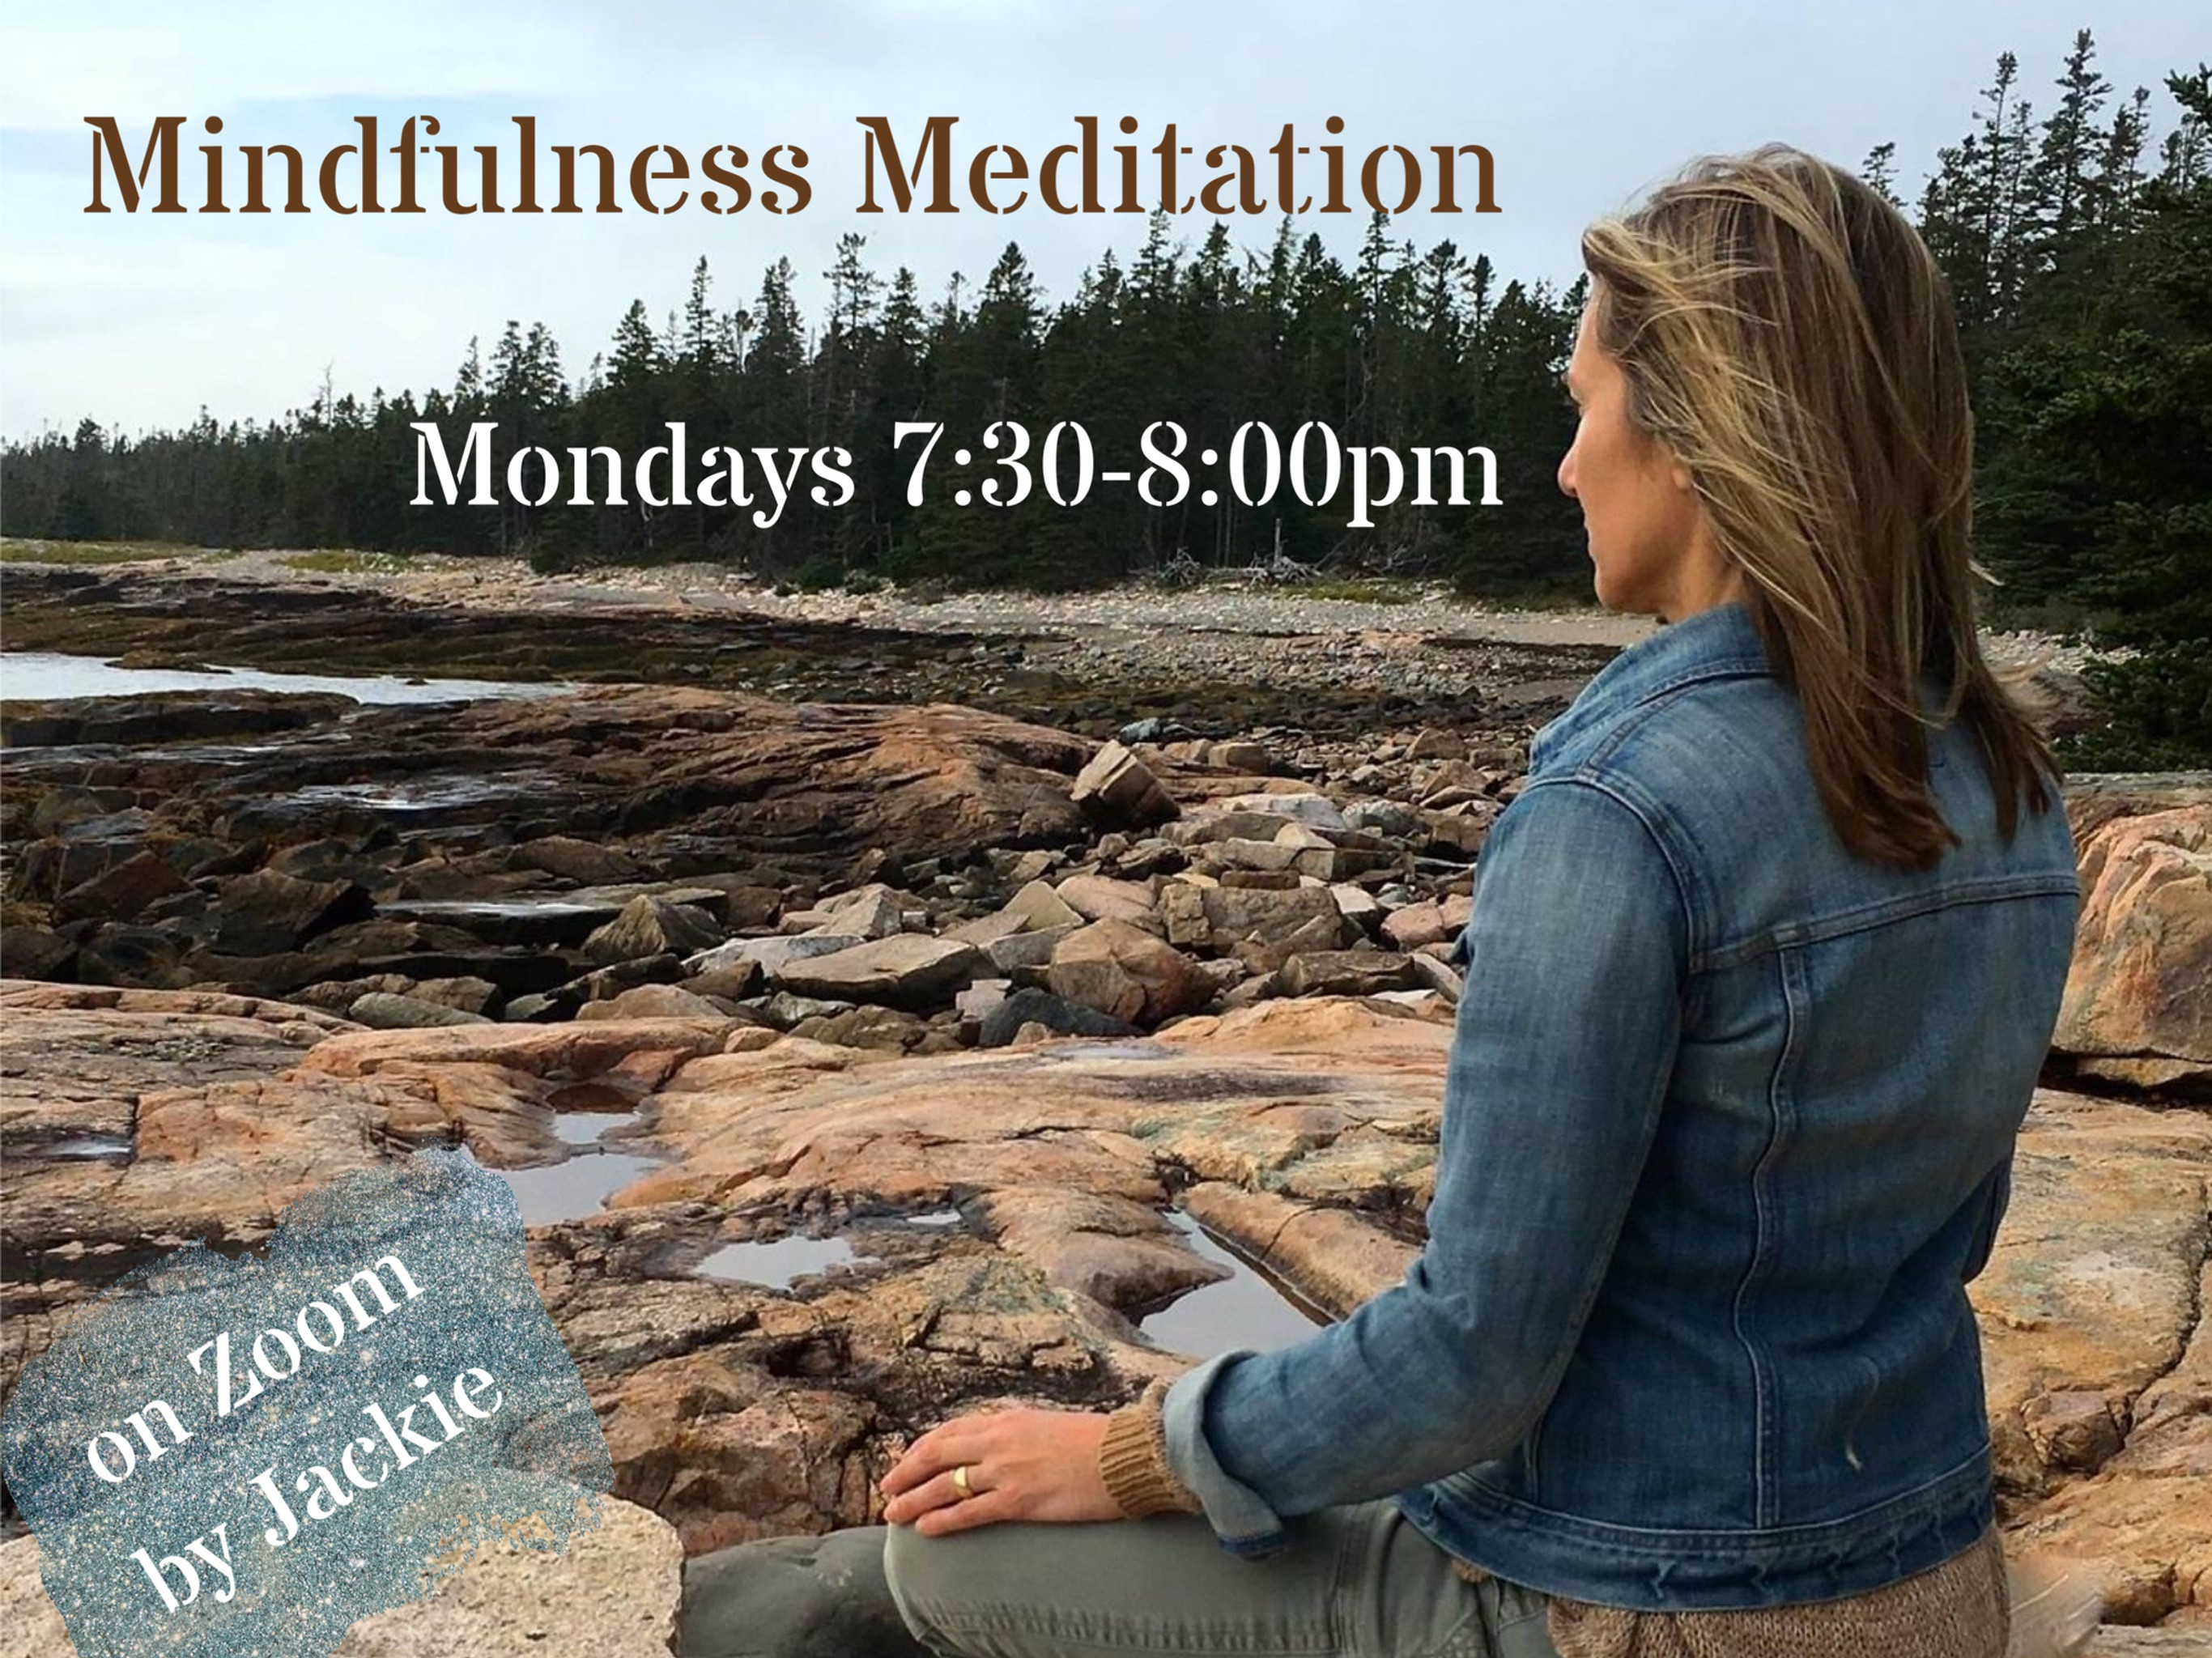 Mindfulness Meditation: 7:30-8:00pm